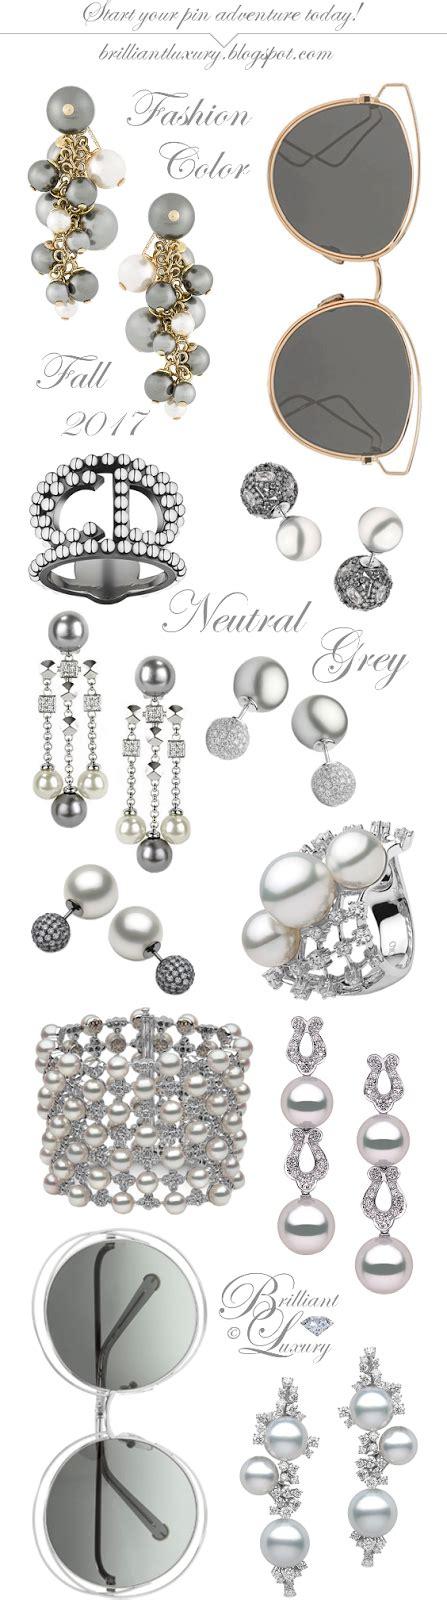 neutral colors fashion pinterest brilliant luxury fashion color fall 2017 neutral grey